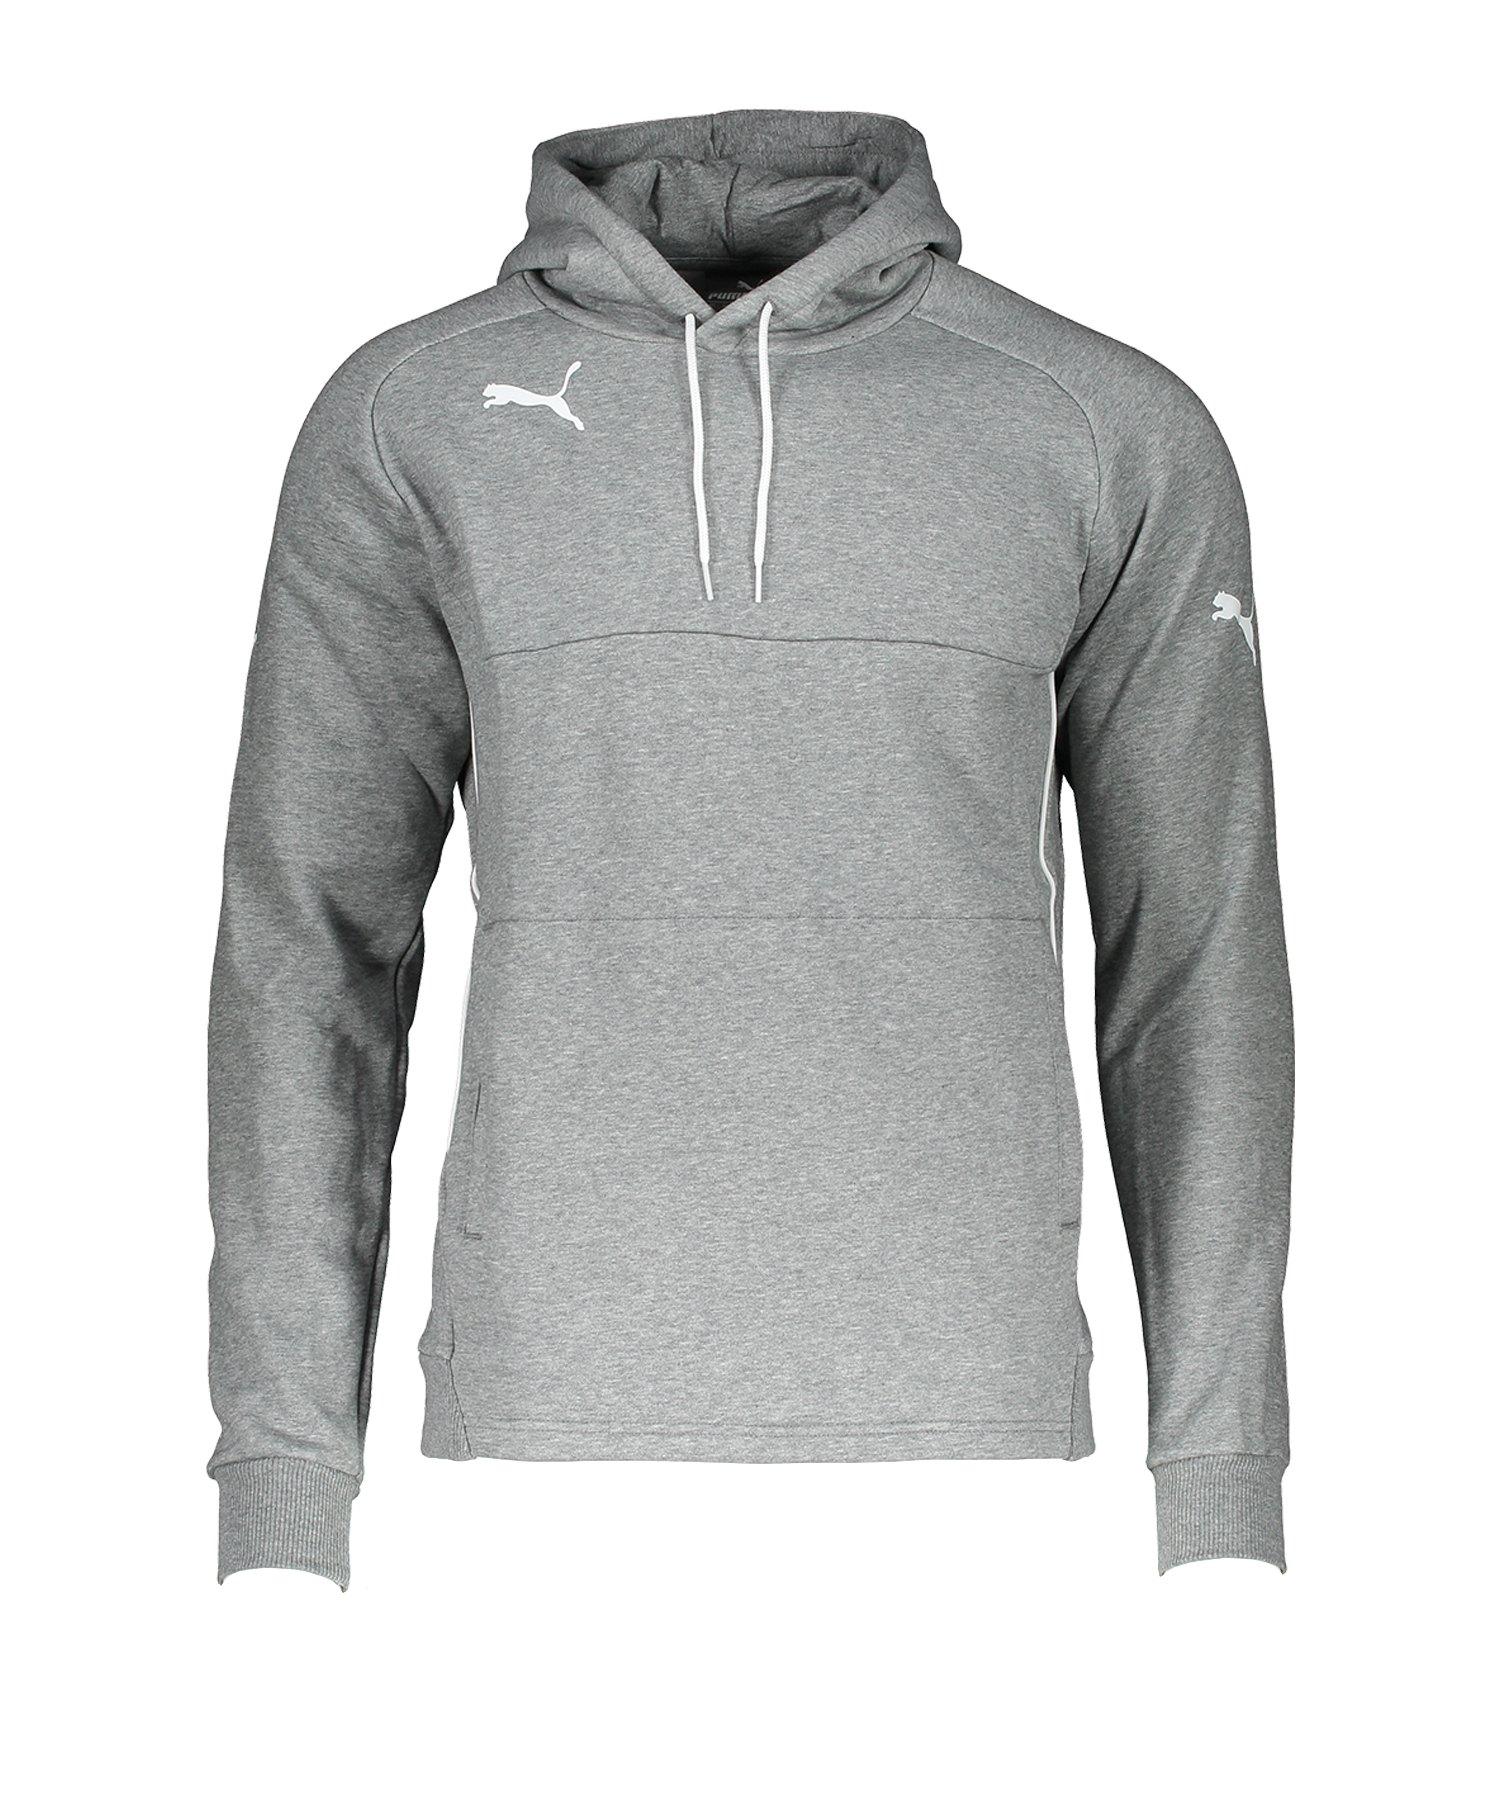 Details zu Real Madrid Zip Hoodie Sweatshirt Kapuzenpullover Fußball Grau Kinder adidas